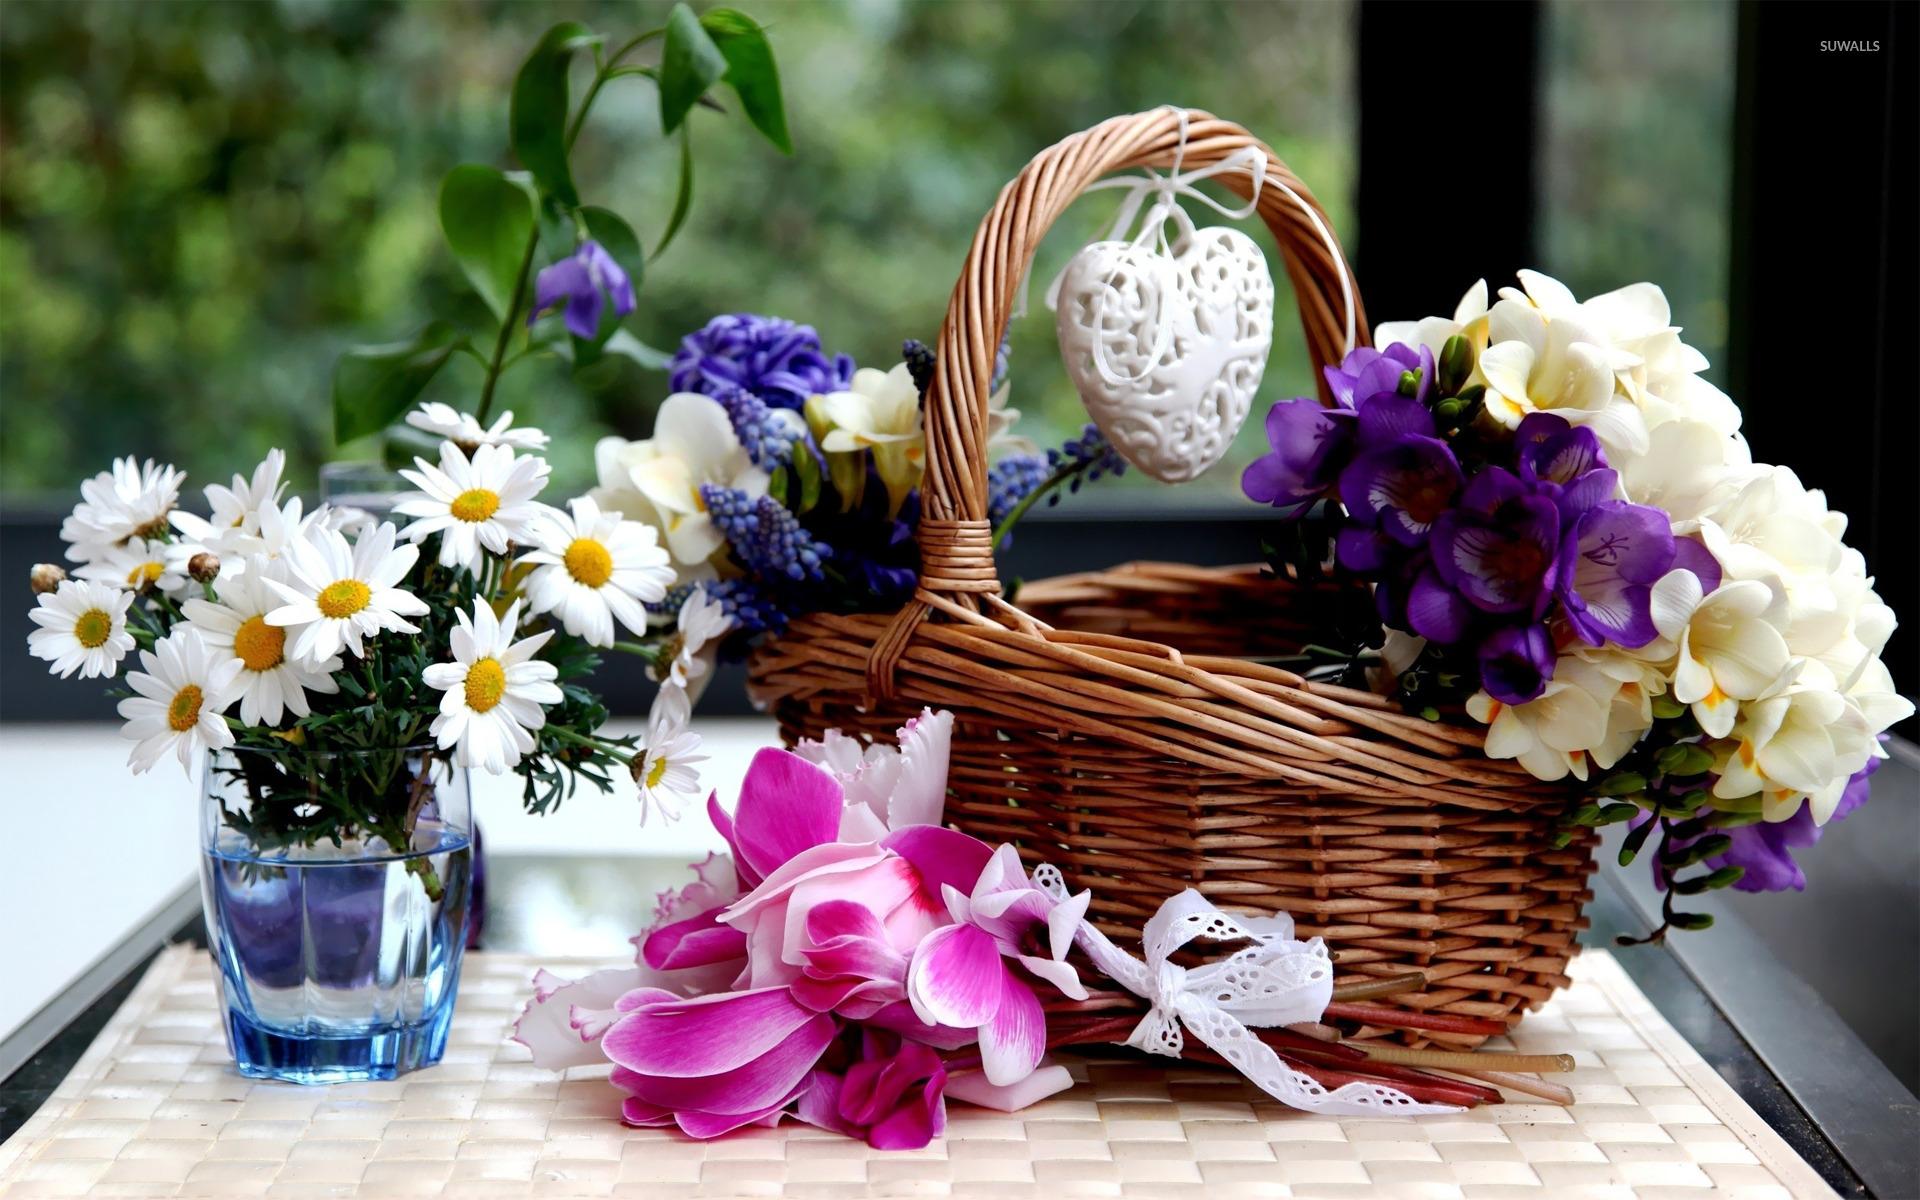 Beautiful Flower Wallpapers - Wallpaper Cave